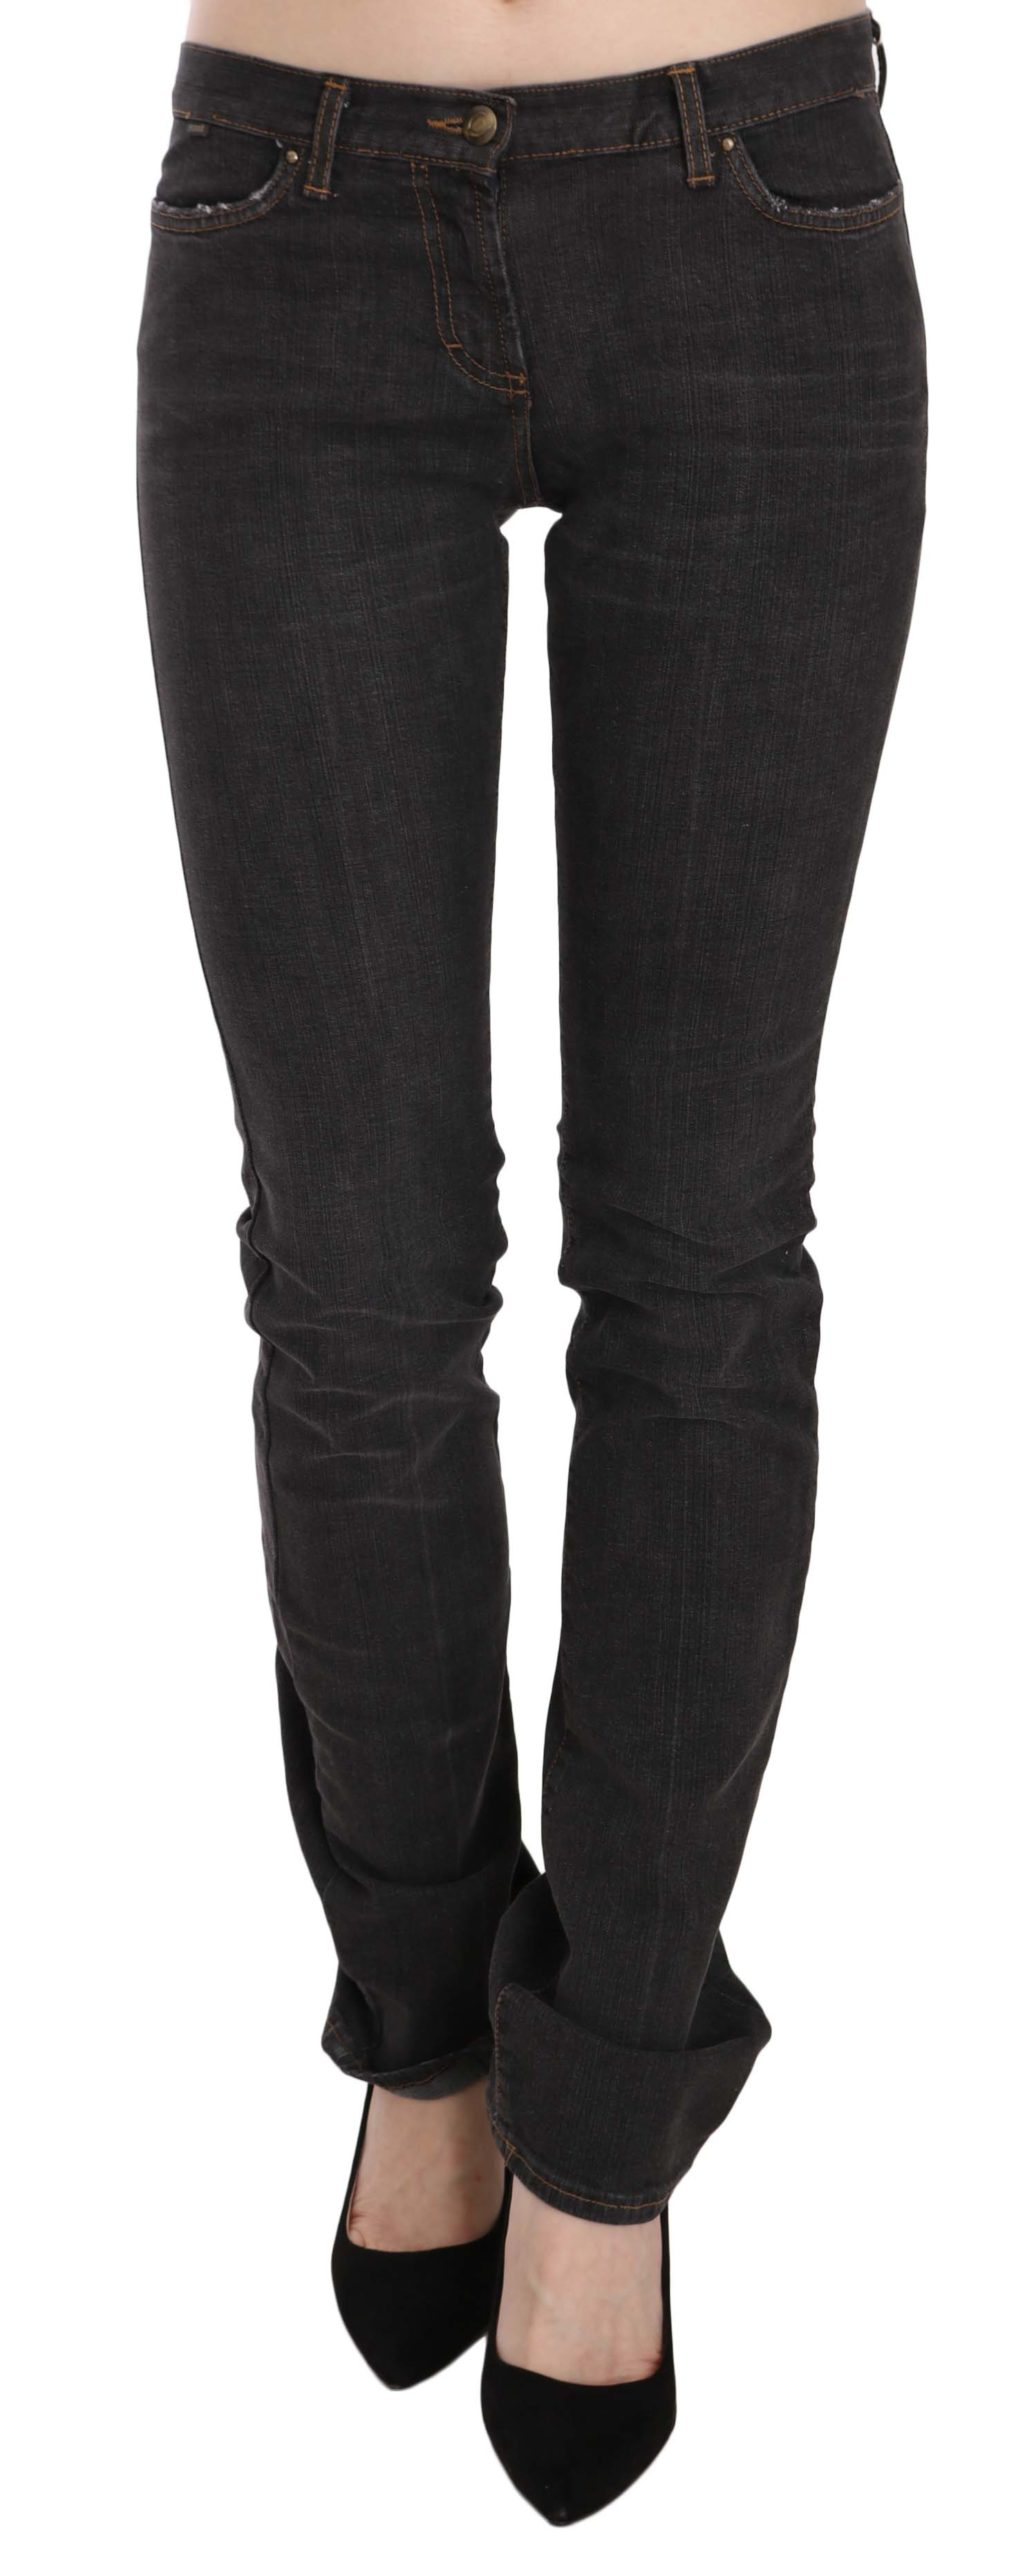 Just Cavalli Women's Low Waist Skinny Denim Trouser Black 57515154 - W26